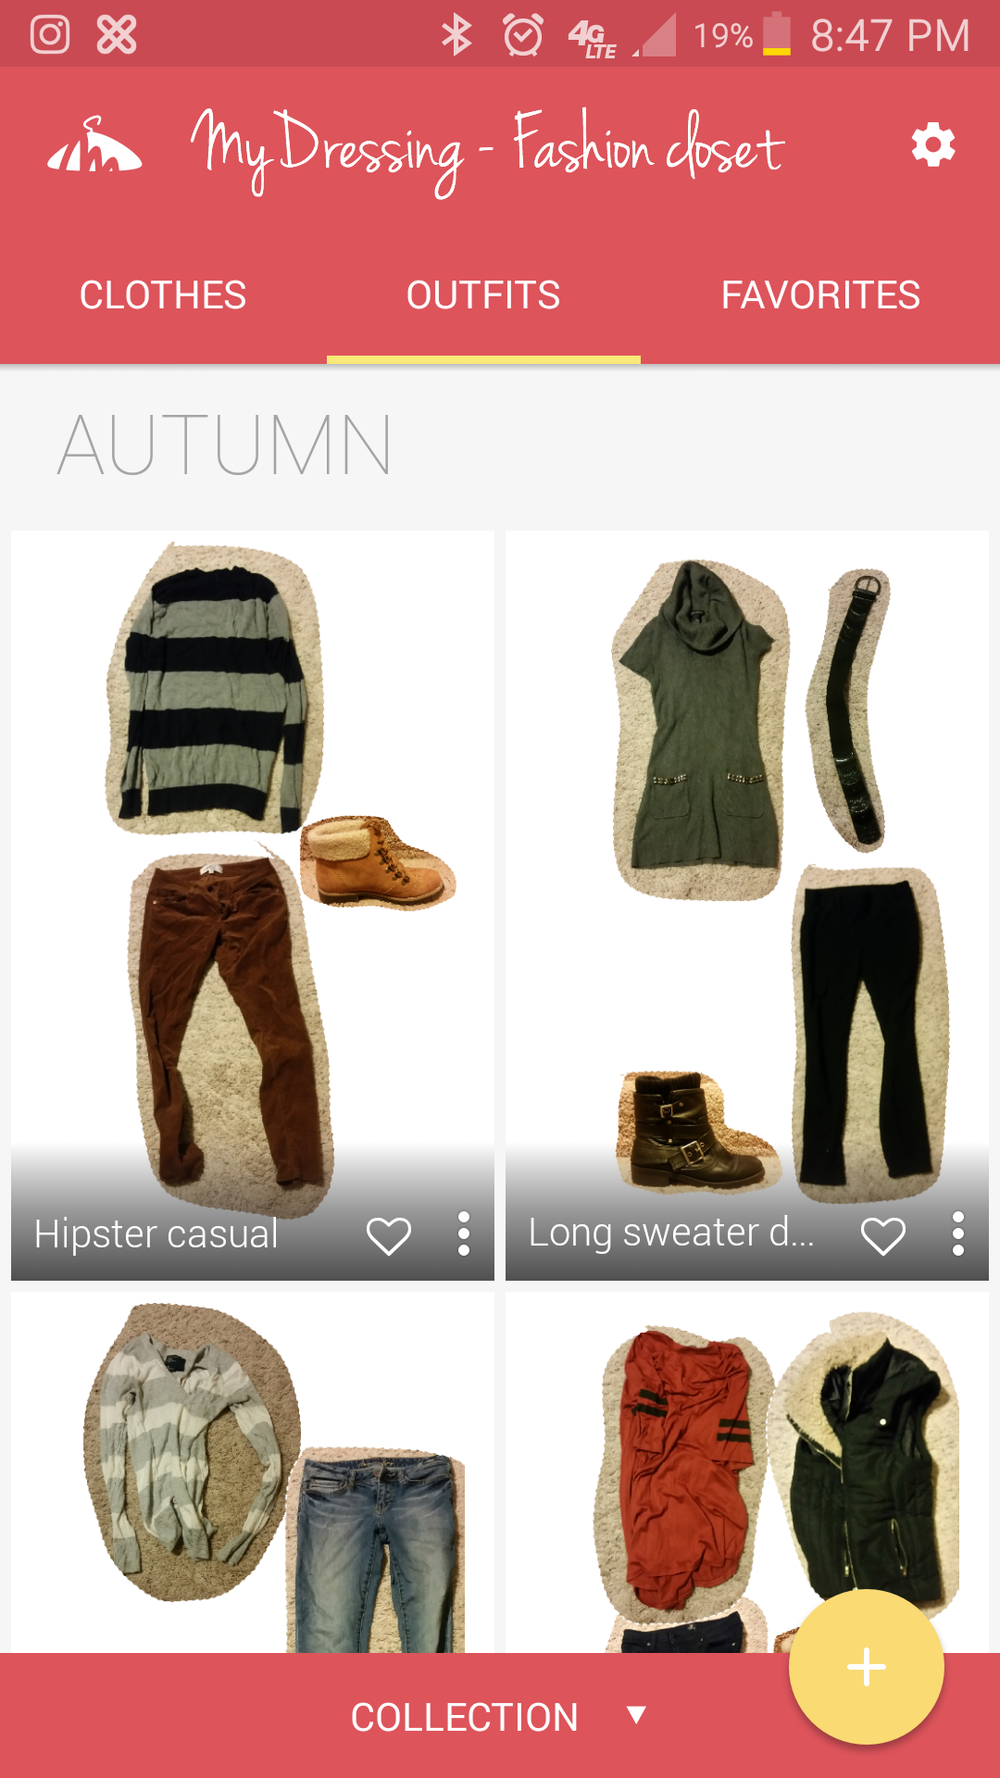 My Dressing App